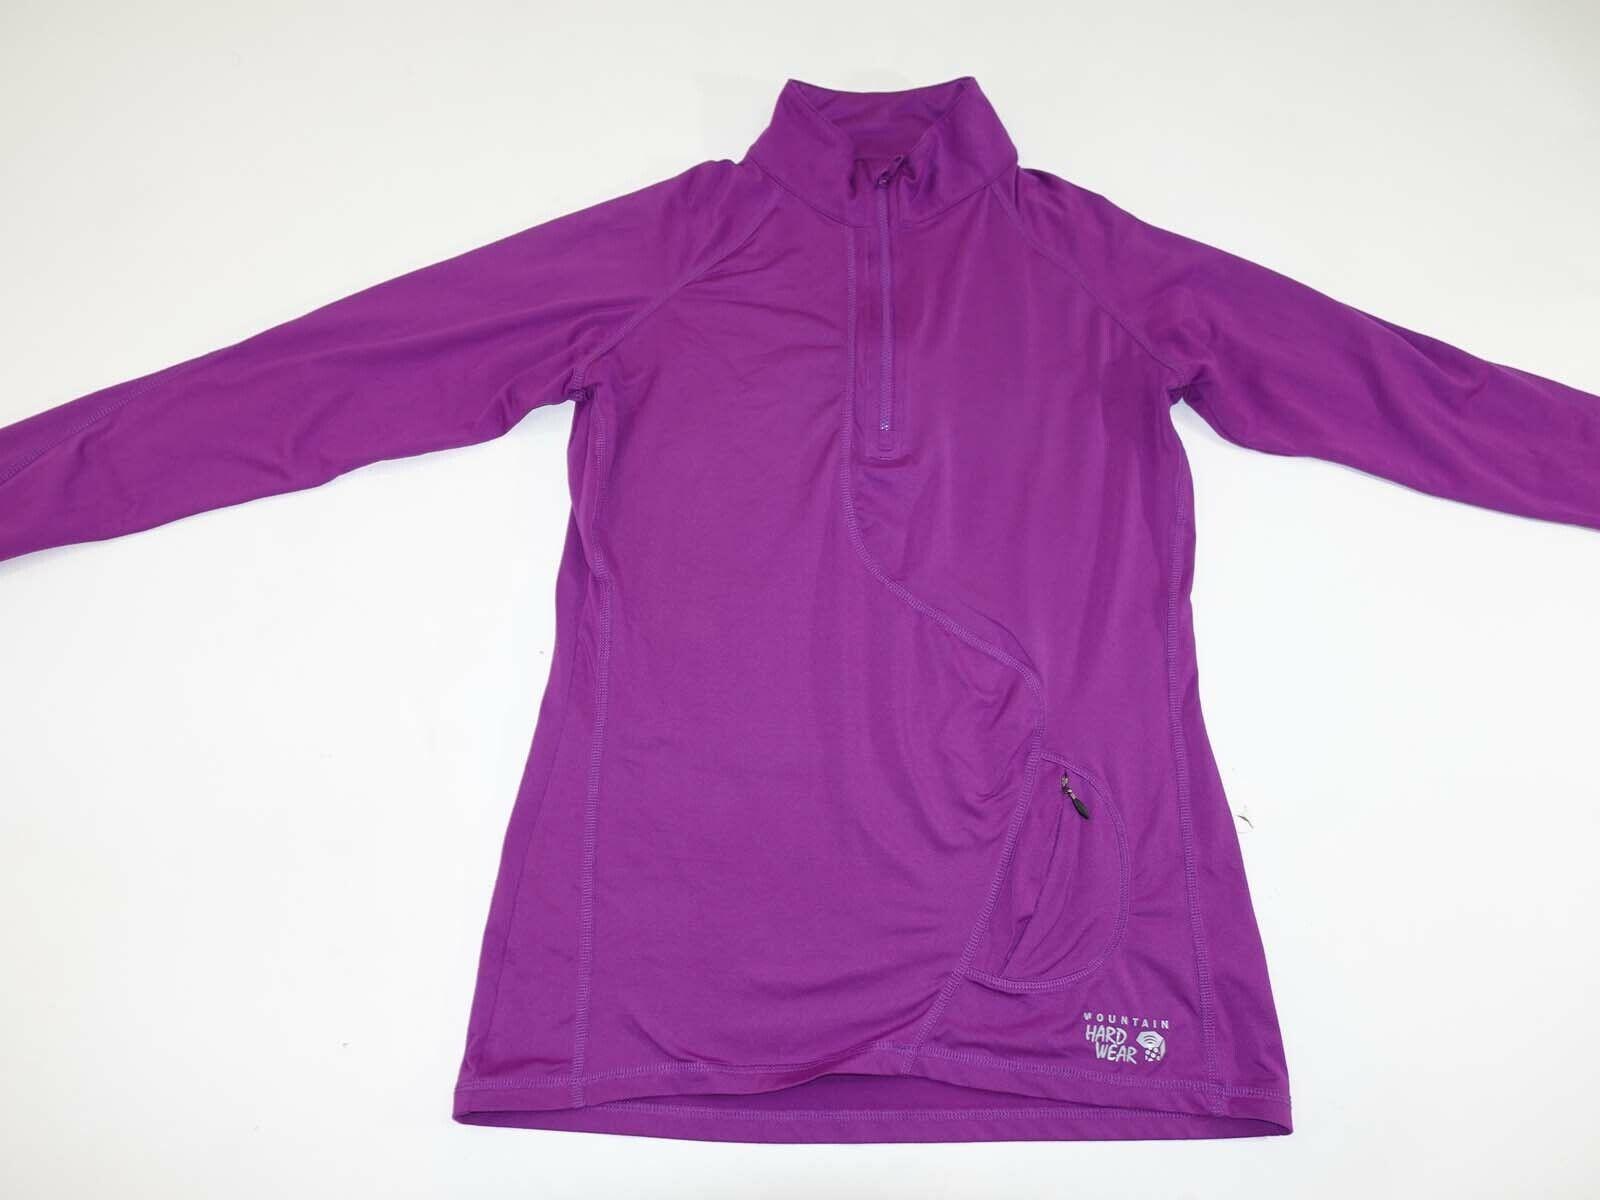 Mountain Hardwear Women's 1/2 Zip Athletic Top Medium Long Sleeves Fuchsia Shirt